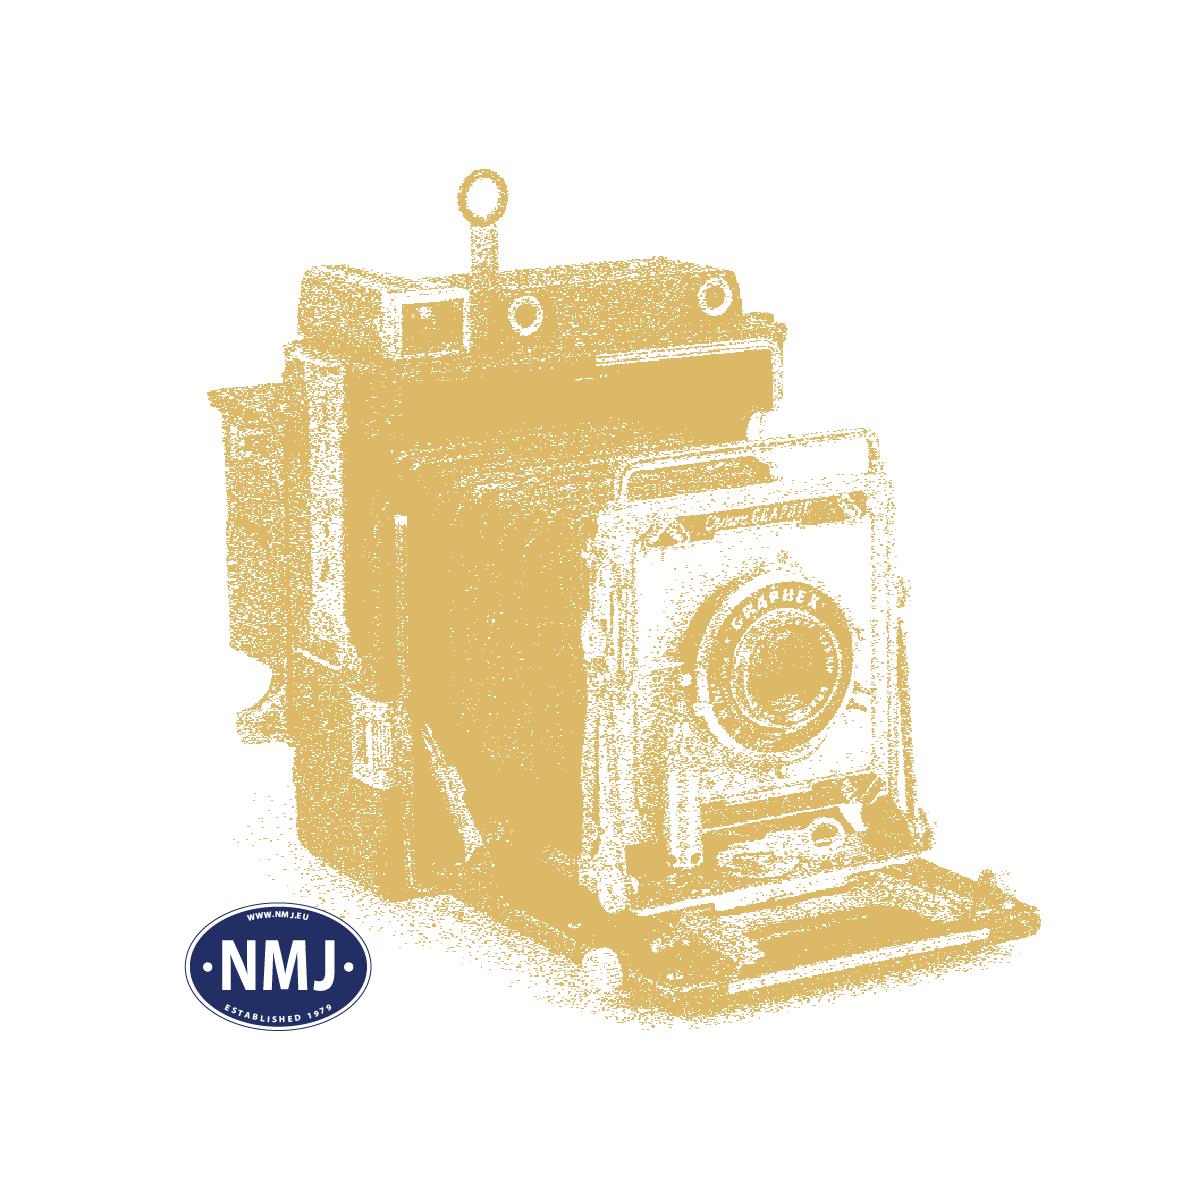 NMJT145401 - NMJ Topline SNCB 204003, 0-Scale